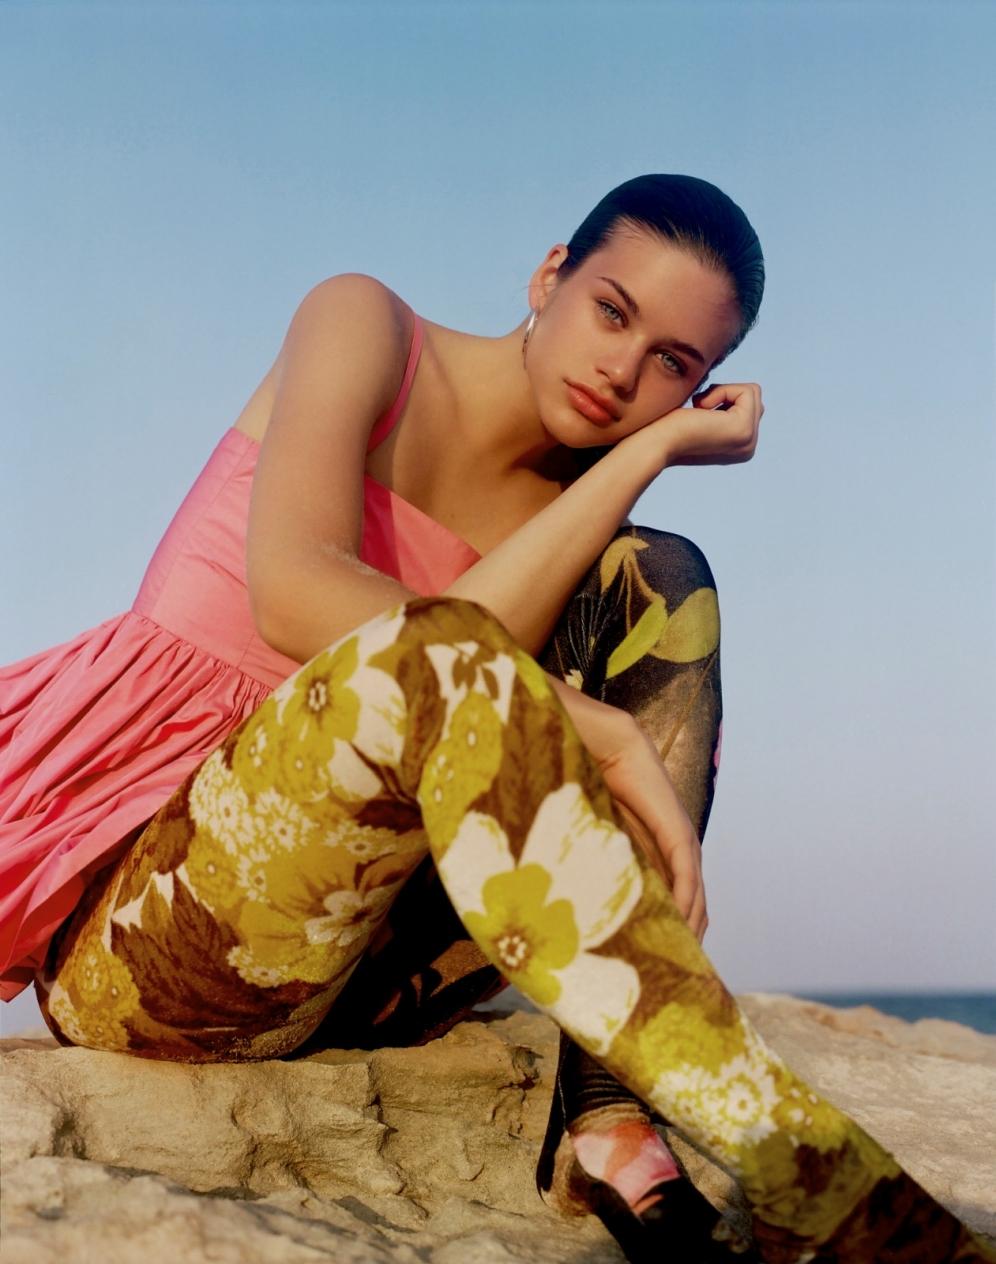 Celia Evans Fashion One Represents